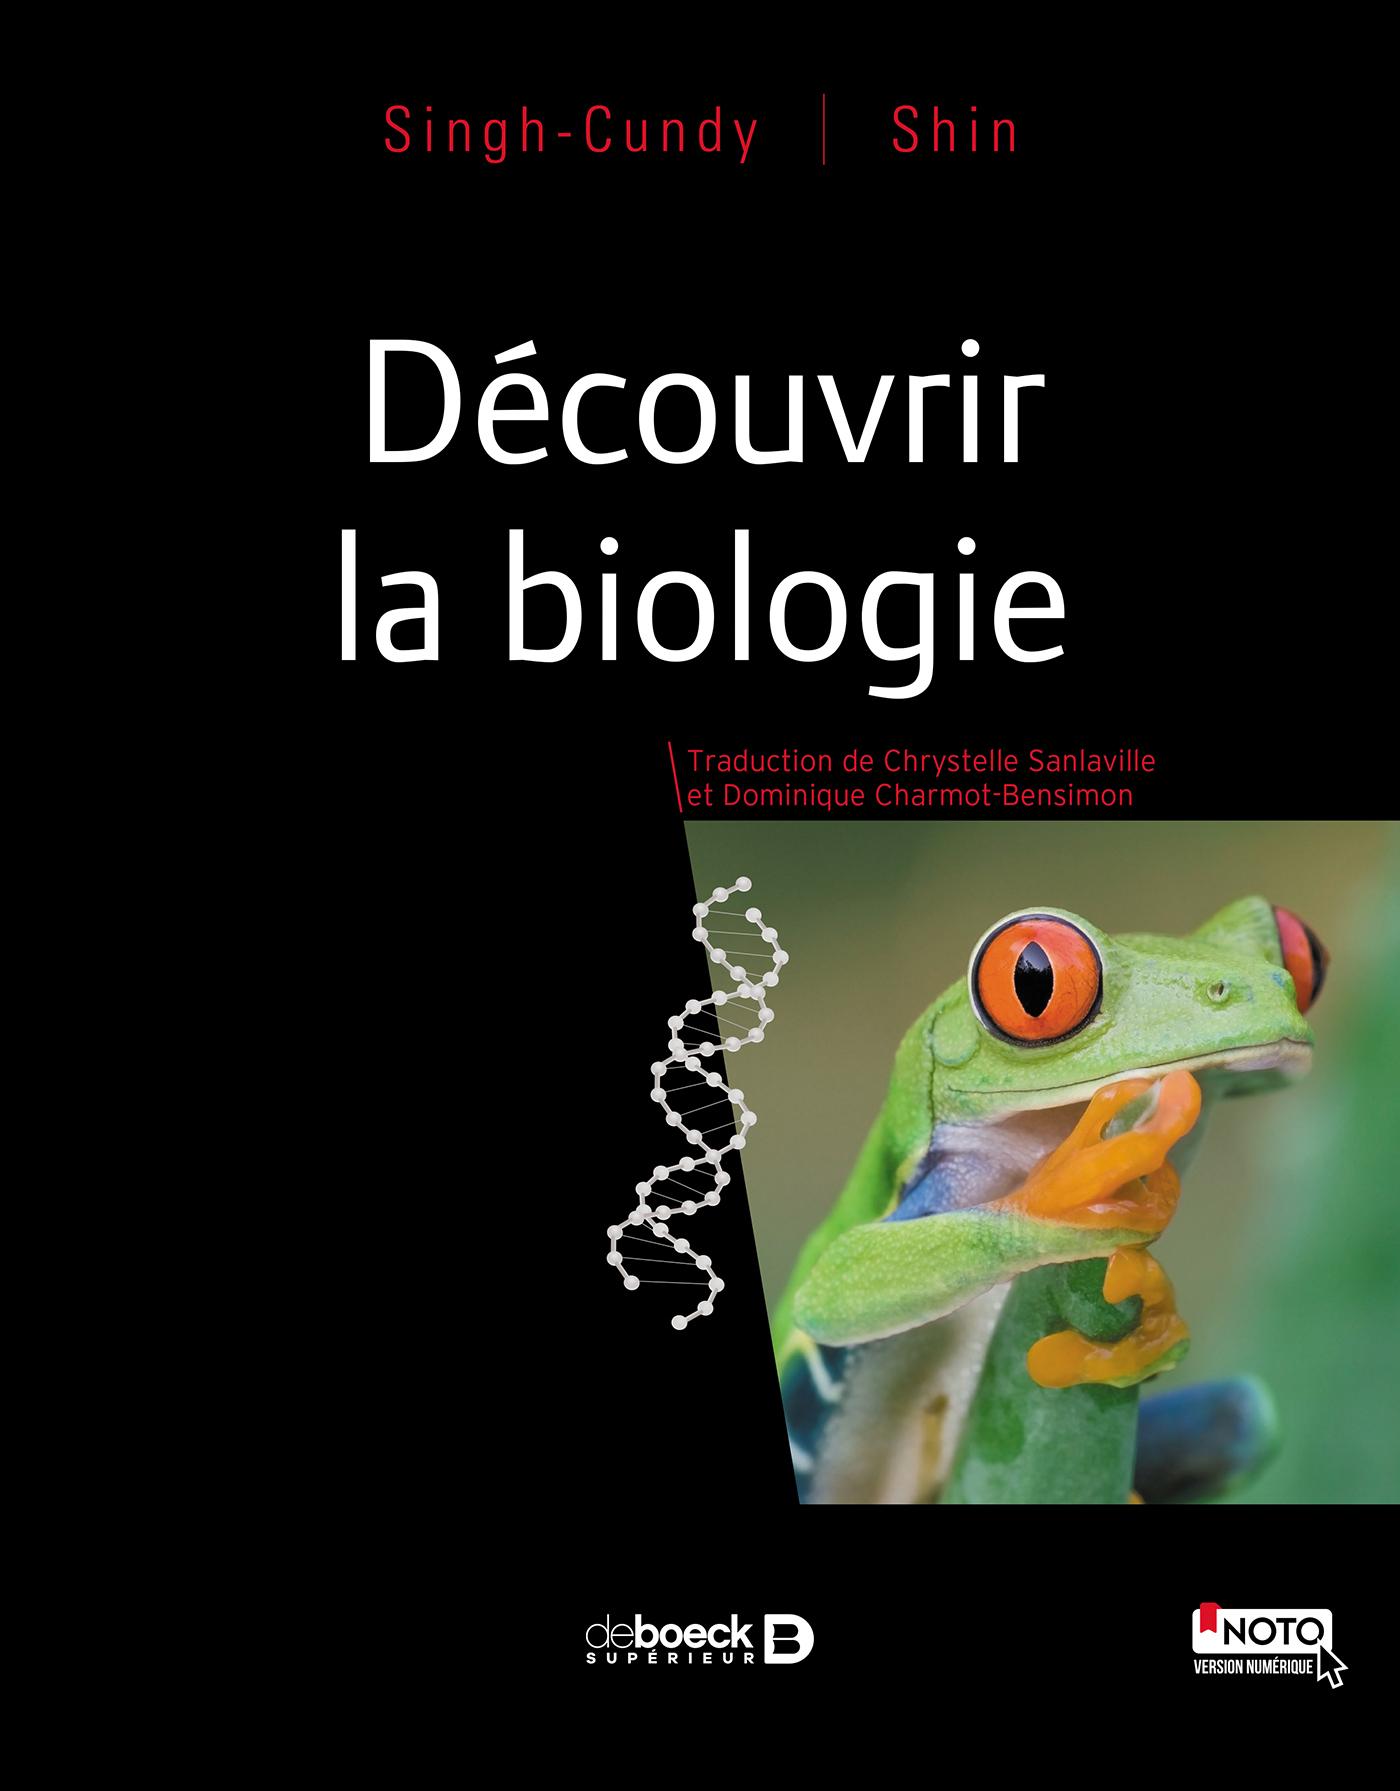 DECOUVRIR LA BIOLOGIE